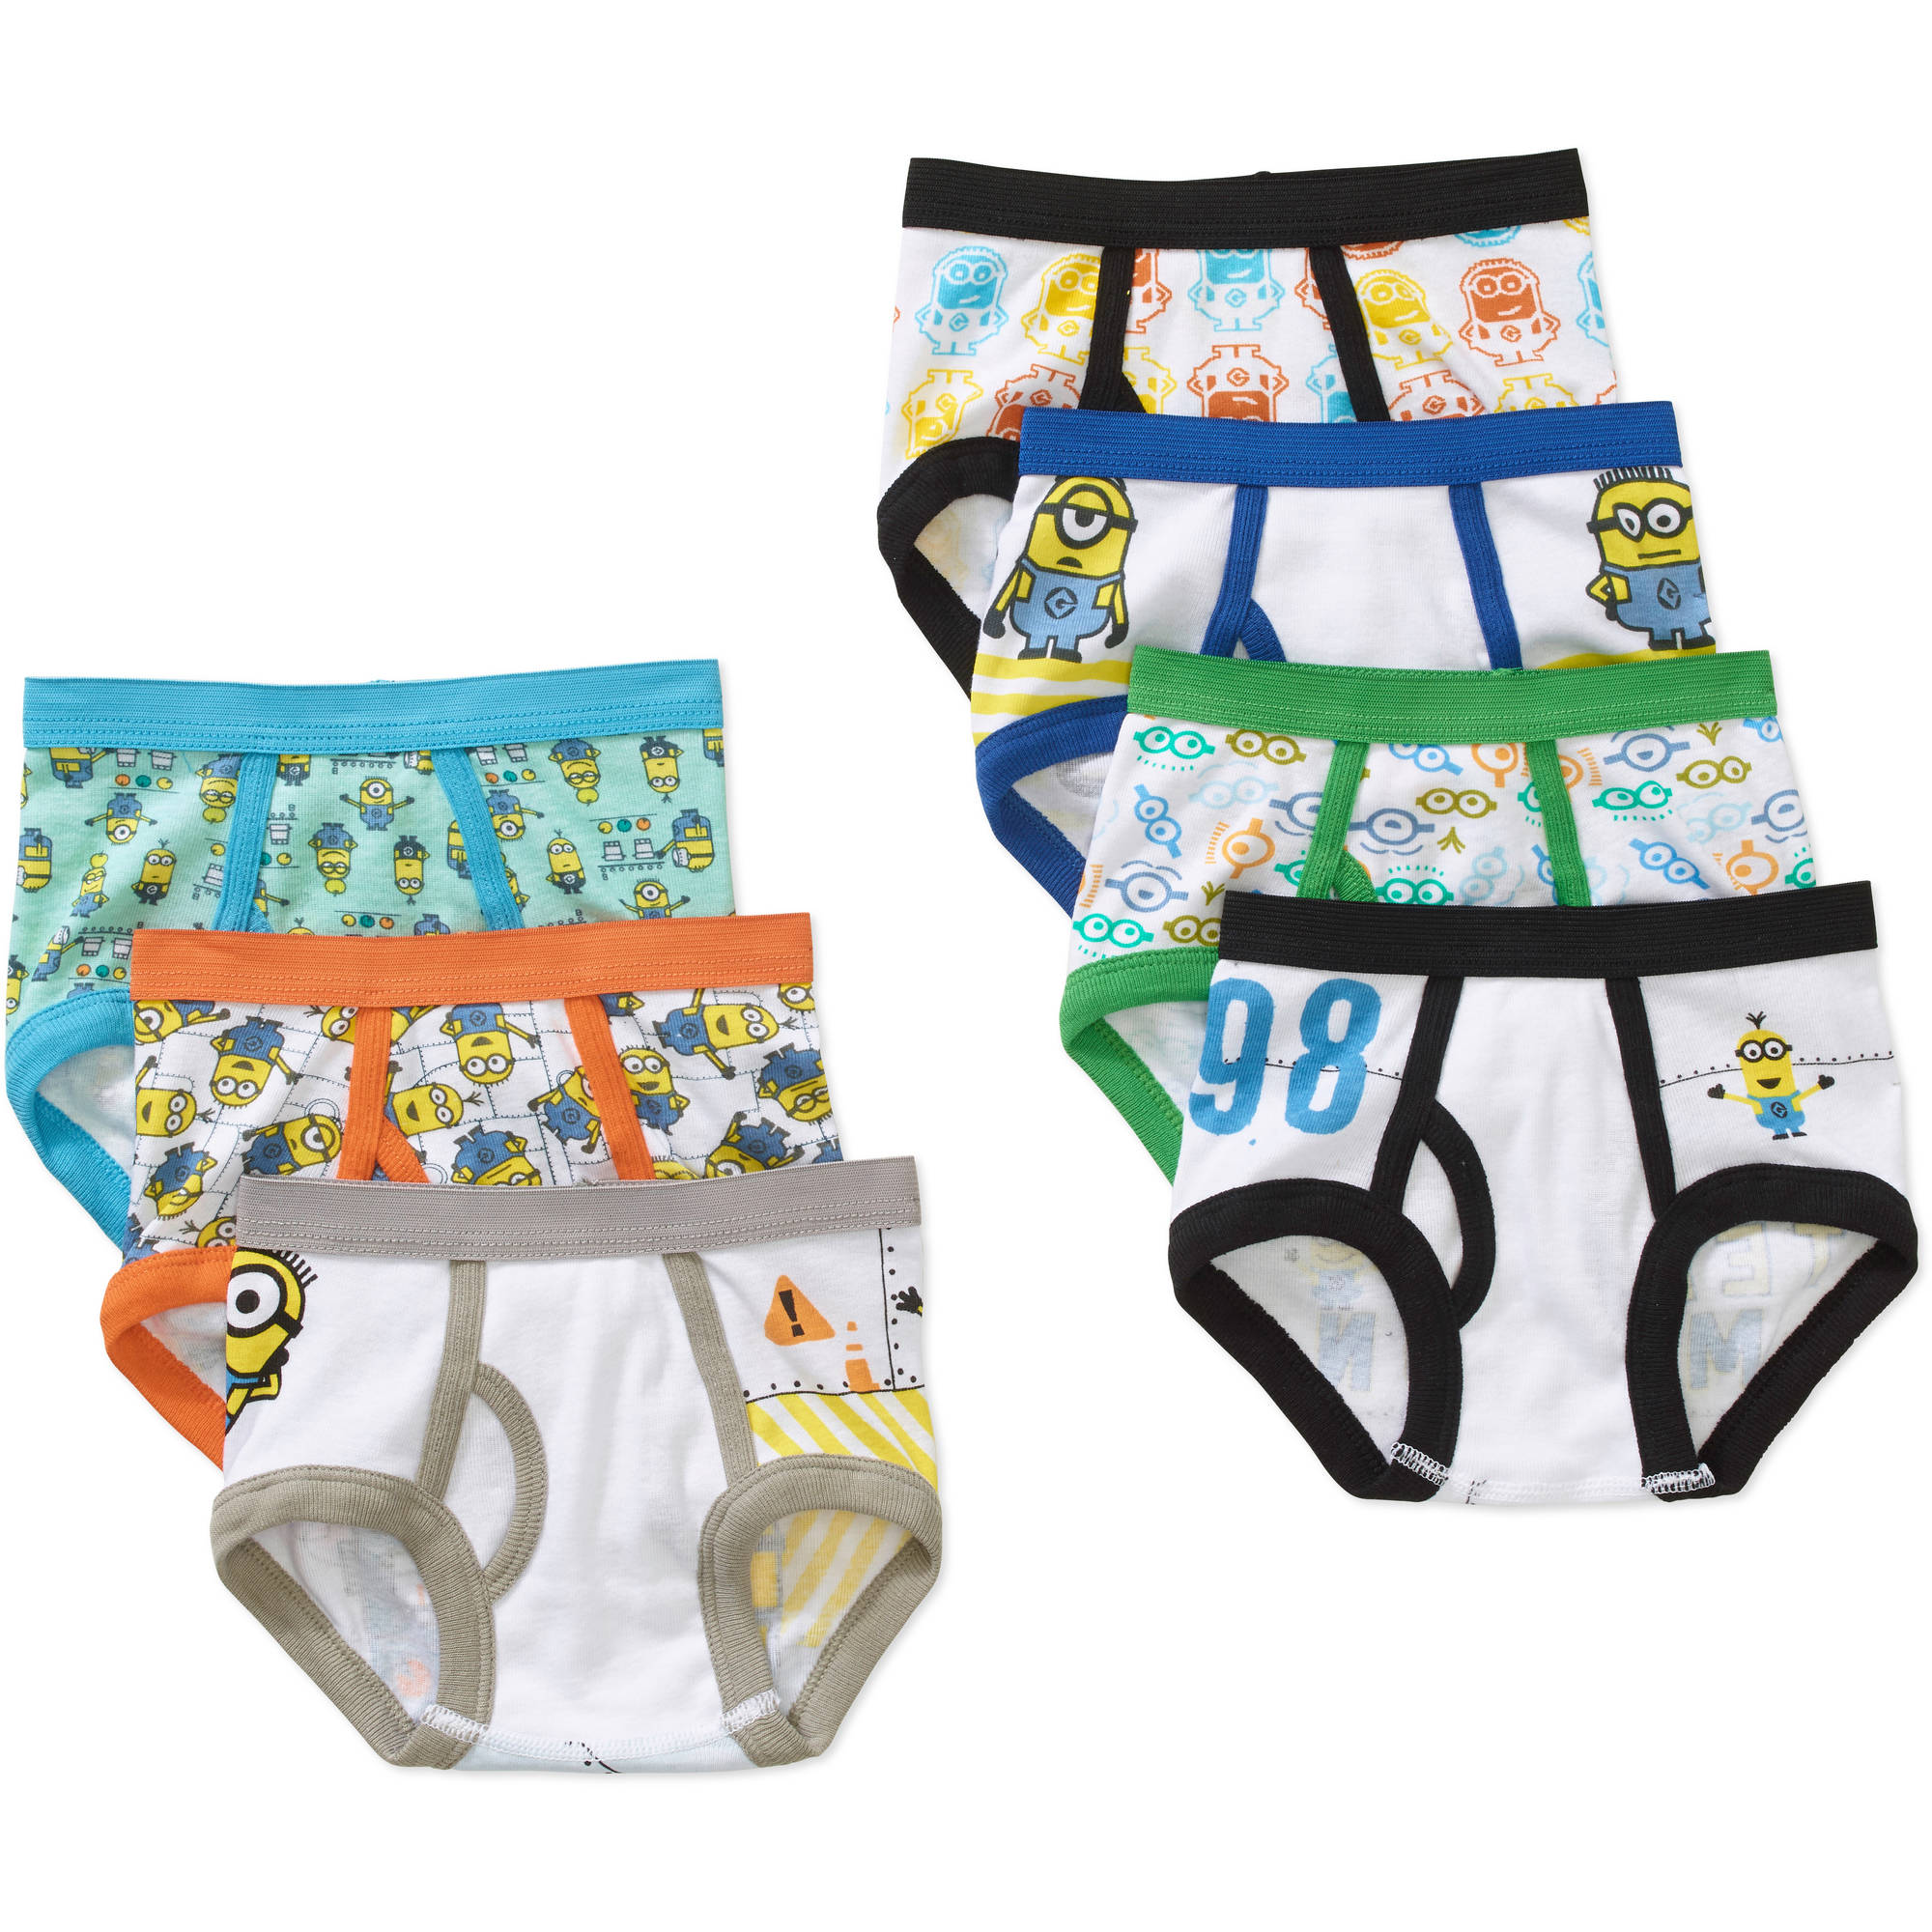 Minions Boys Underwear Briefs Despicable Me 5 Count